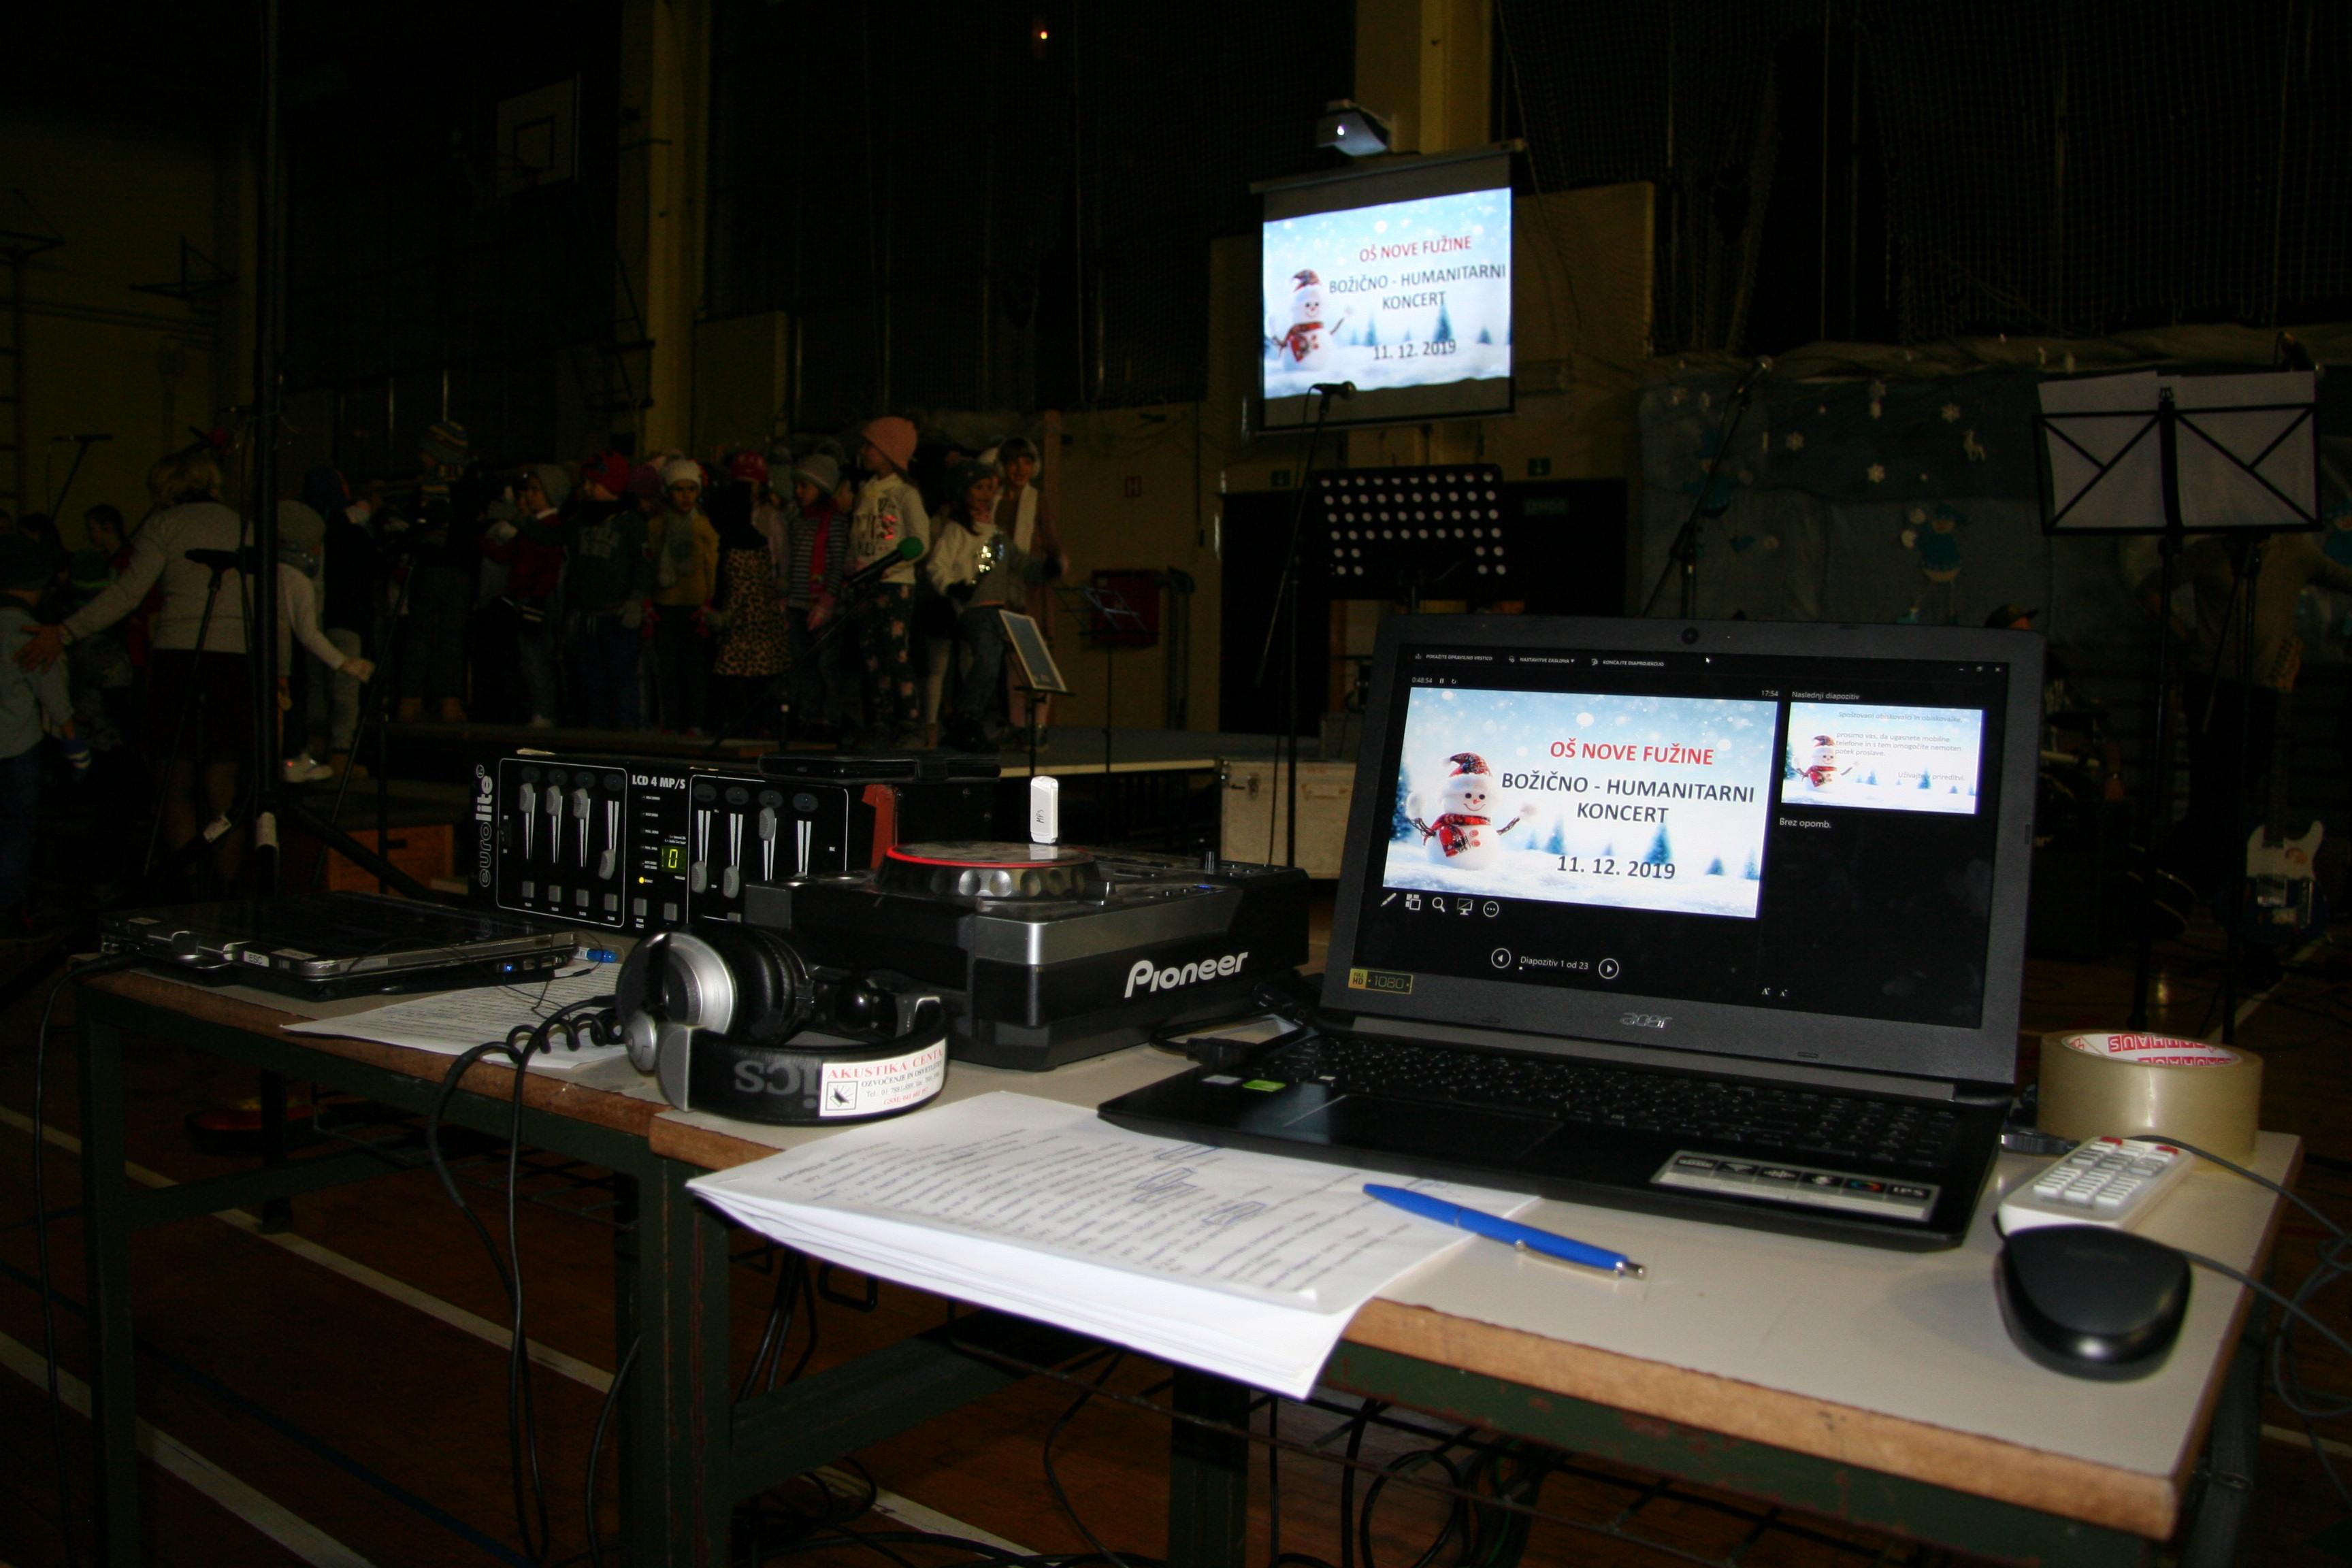 novoletno_humanitarni-koncert-2019-020